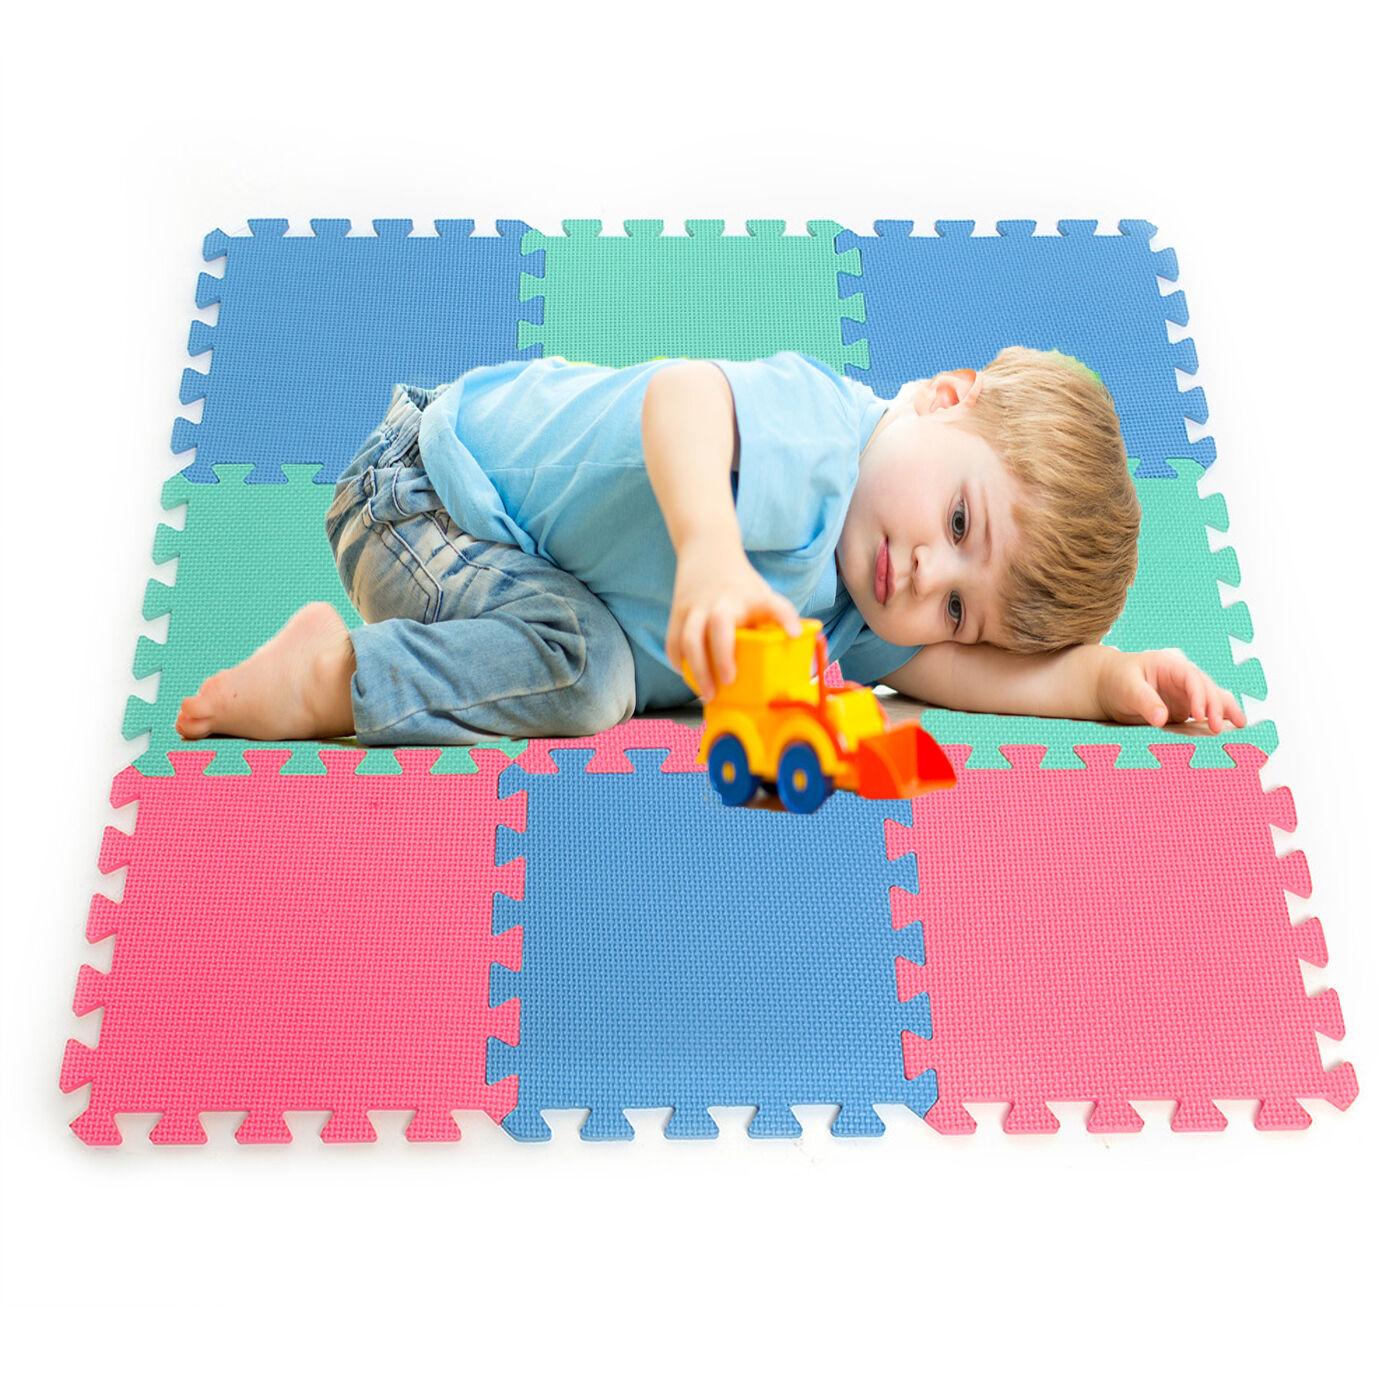 Doux gym eva interlocking mousse kids play tapis salle de gym Doux home office flooring tiles daf5ac